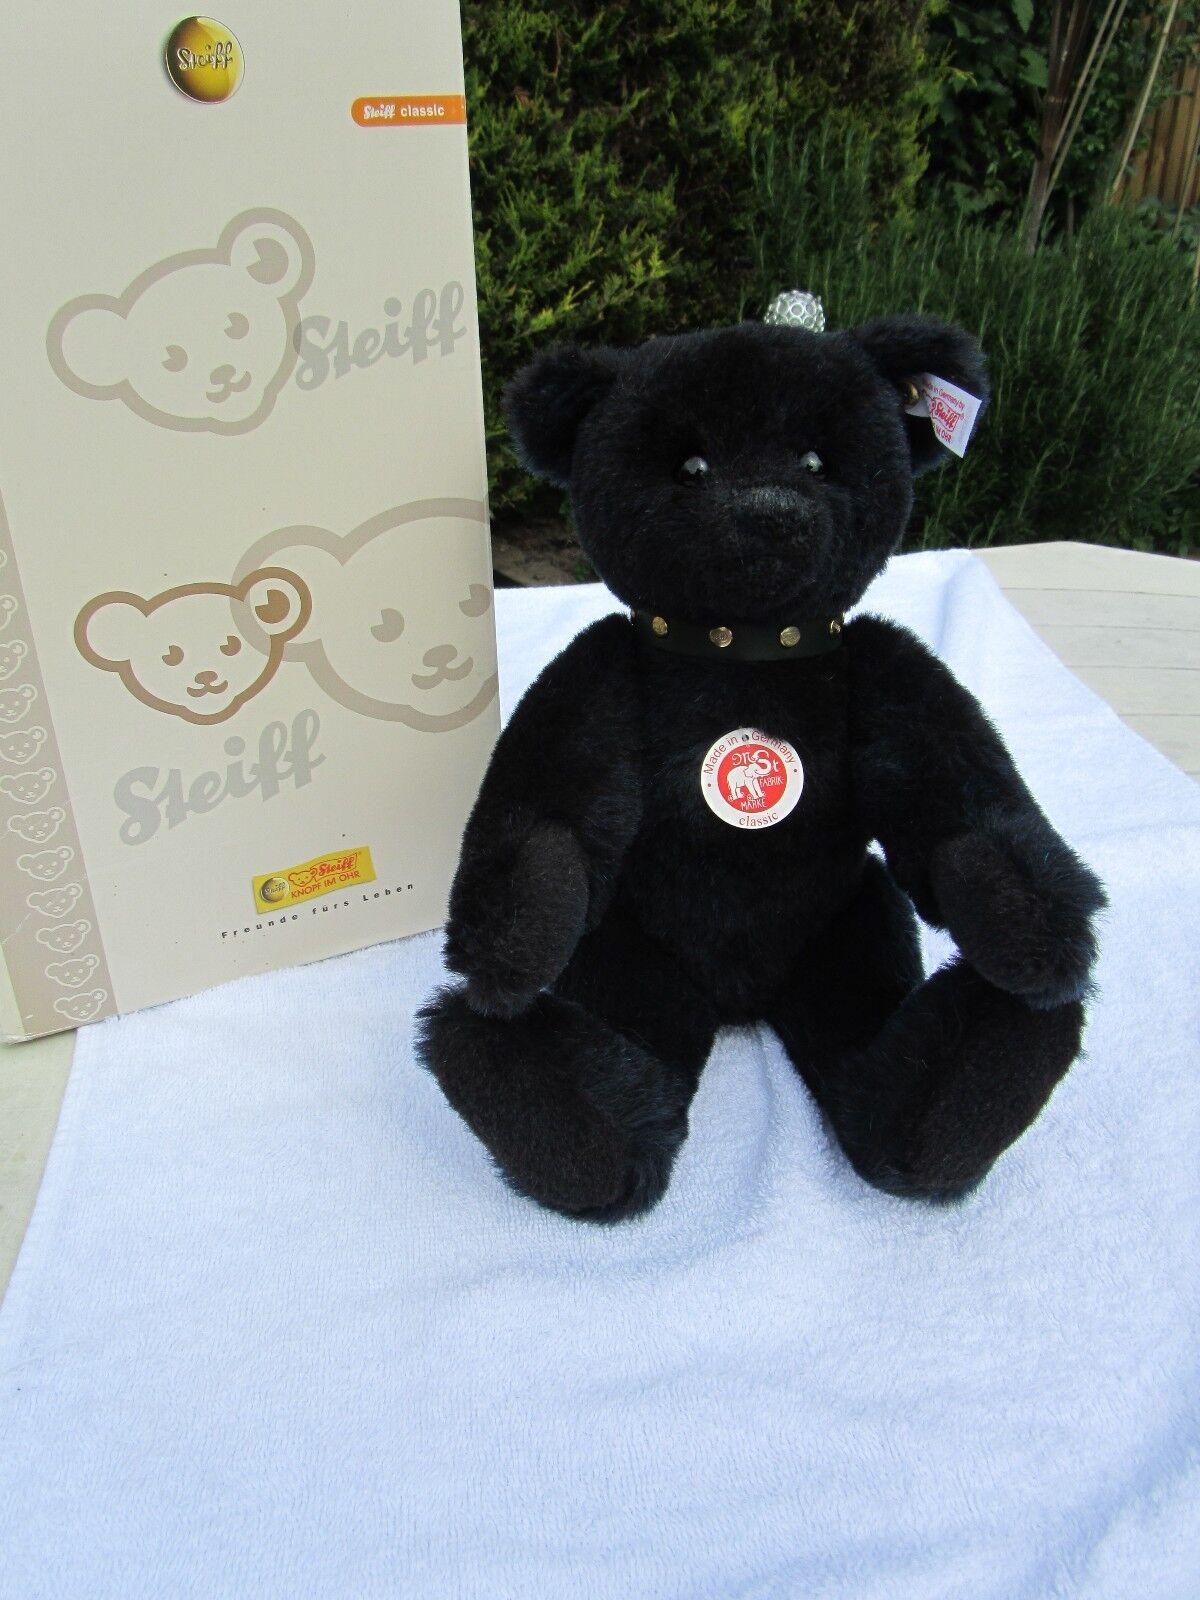 Steiff Classic Teddy Bear Blau schwarz Alpaca 038280 038280 038280 growler - Boxed Cert bff84e